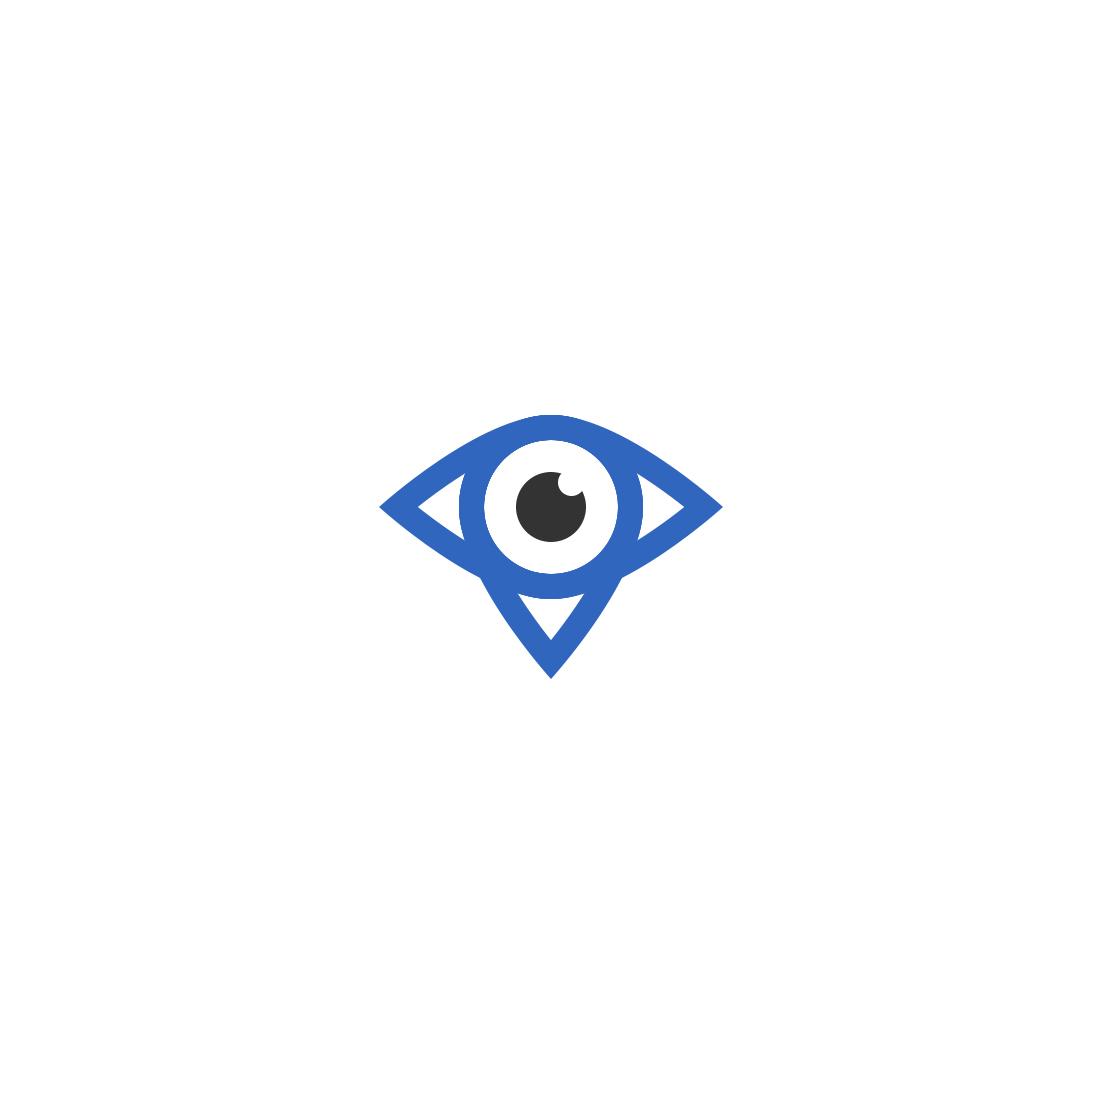 Разработка логотипа для компании Gamaya фото f_3905482191a9b282.jpg